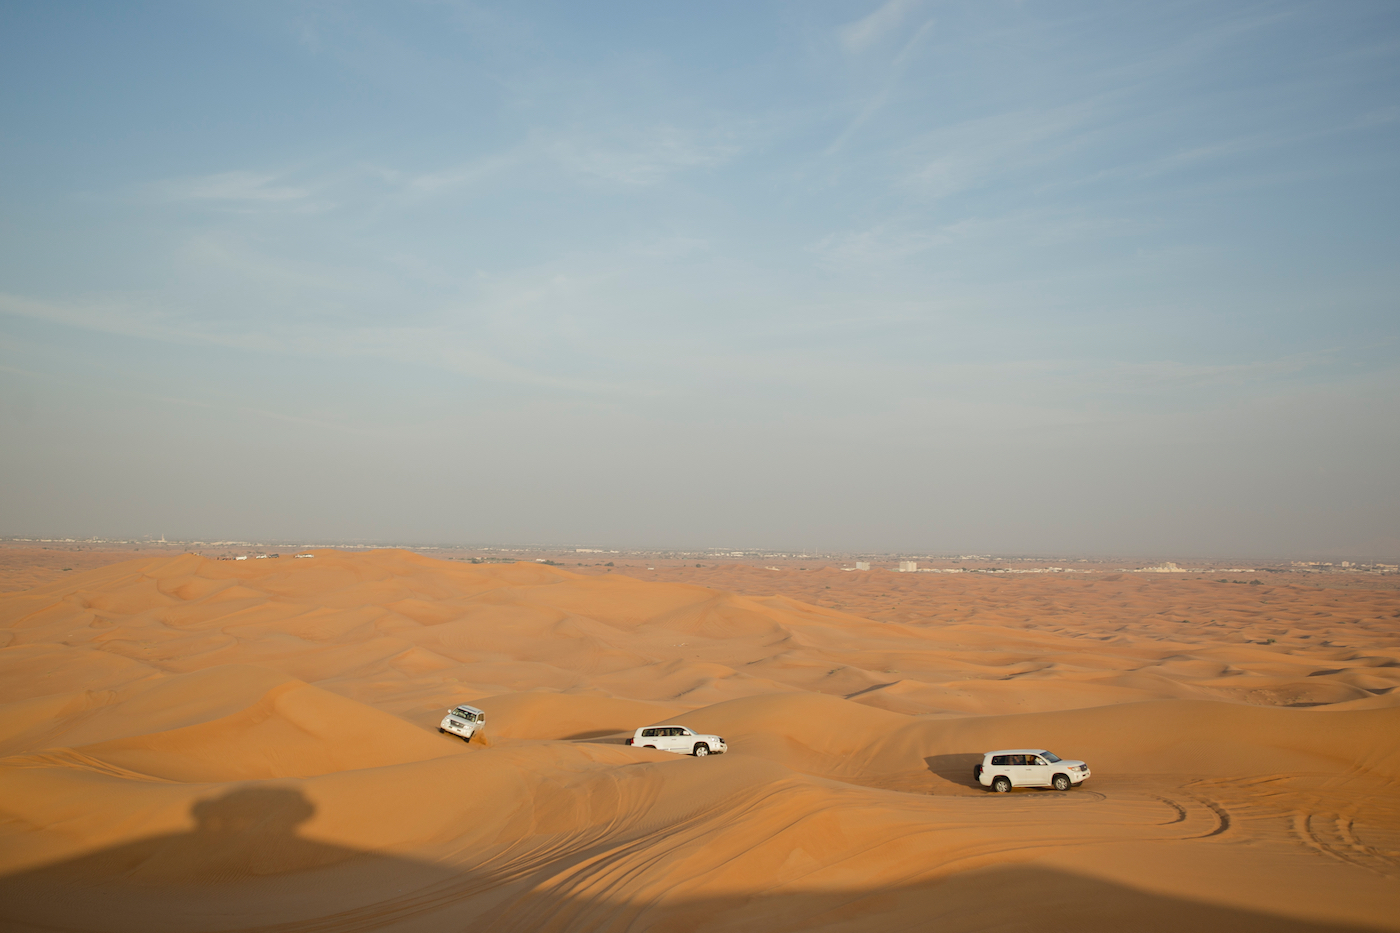 desert safari dubai _ desert dubai _ how to get to the desert dubai _ dubai desert safari